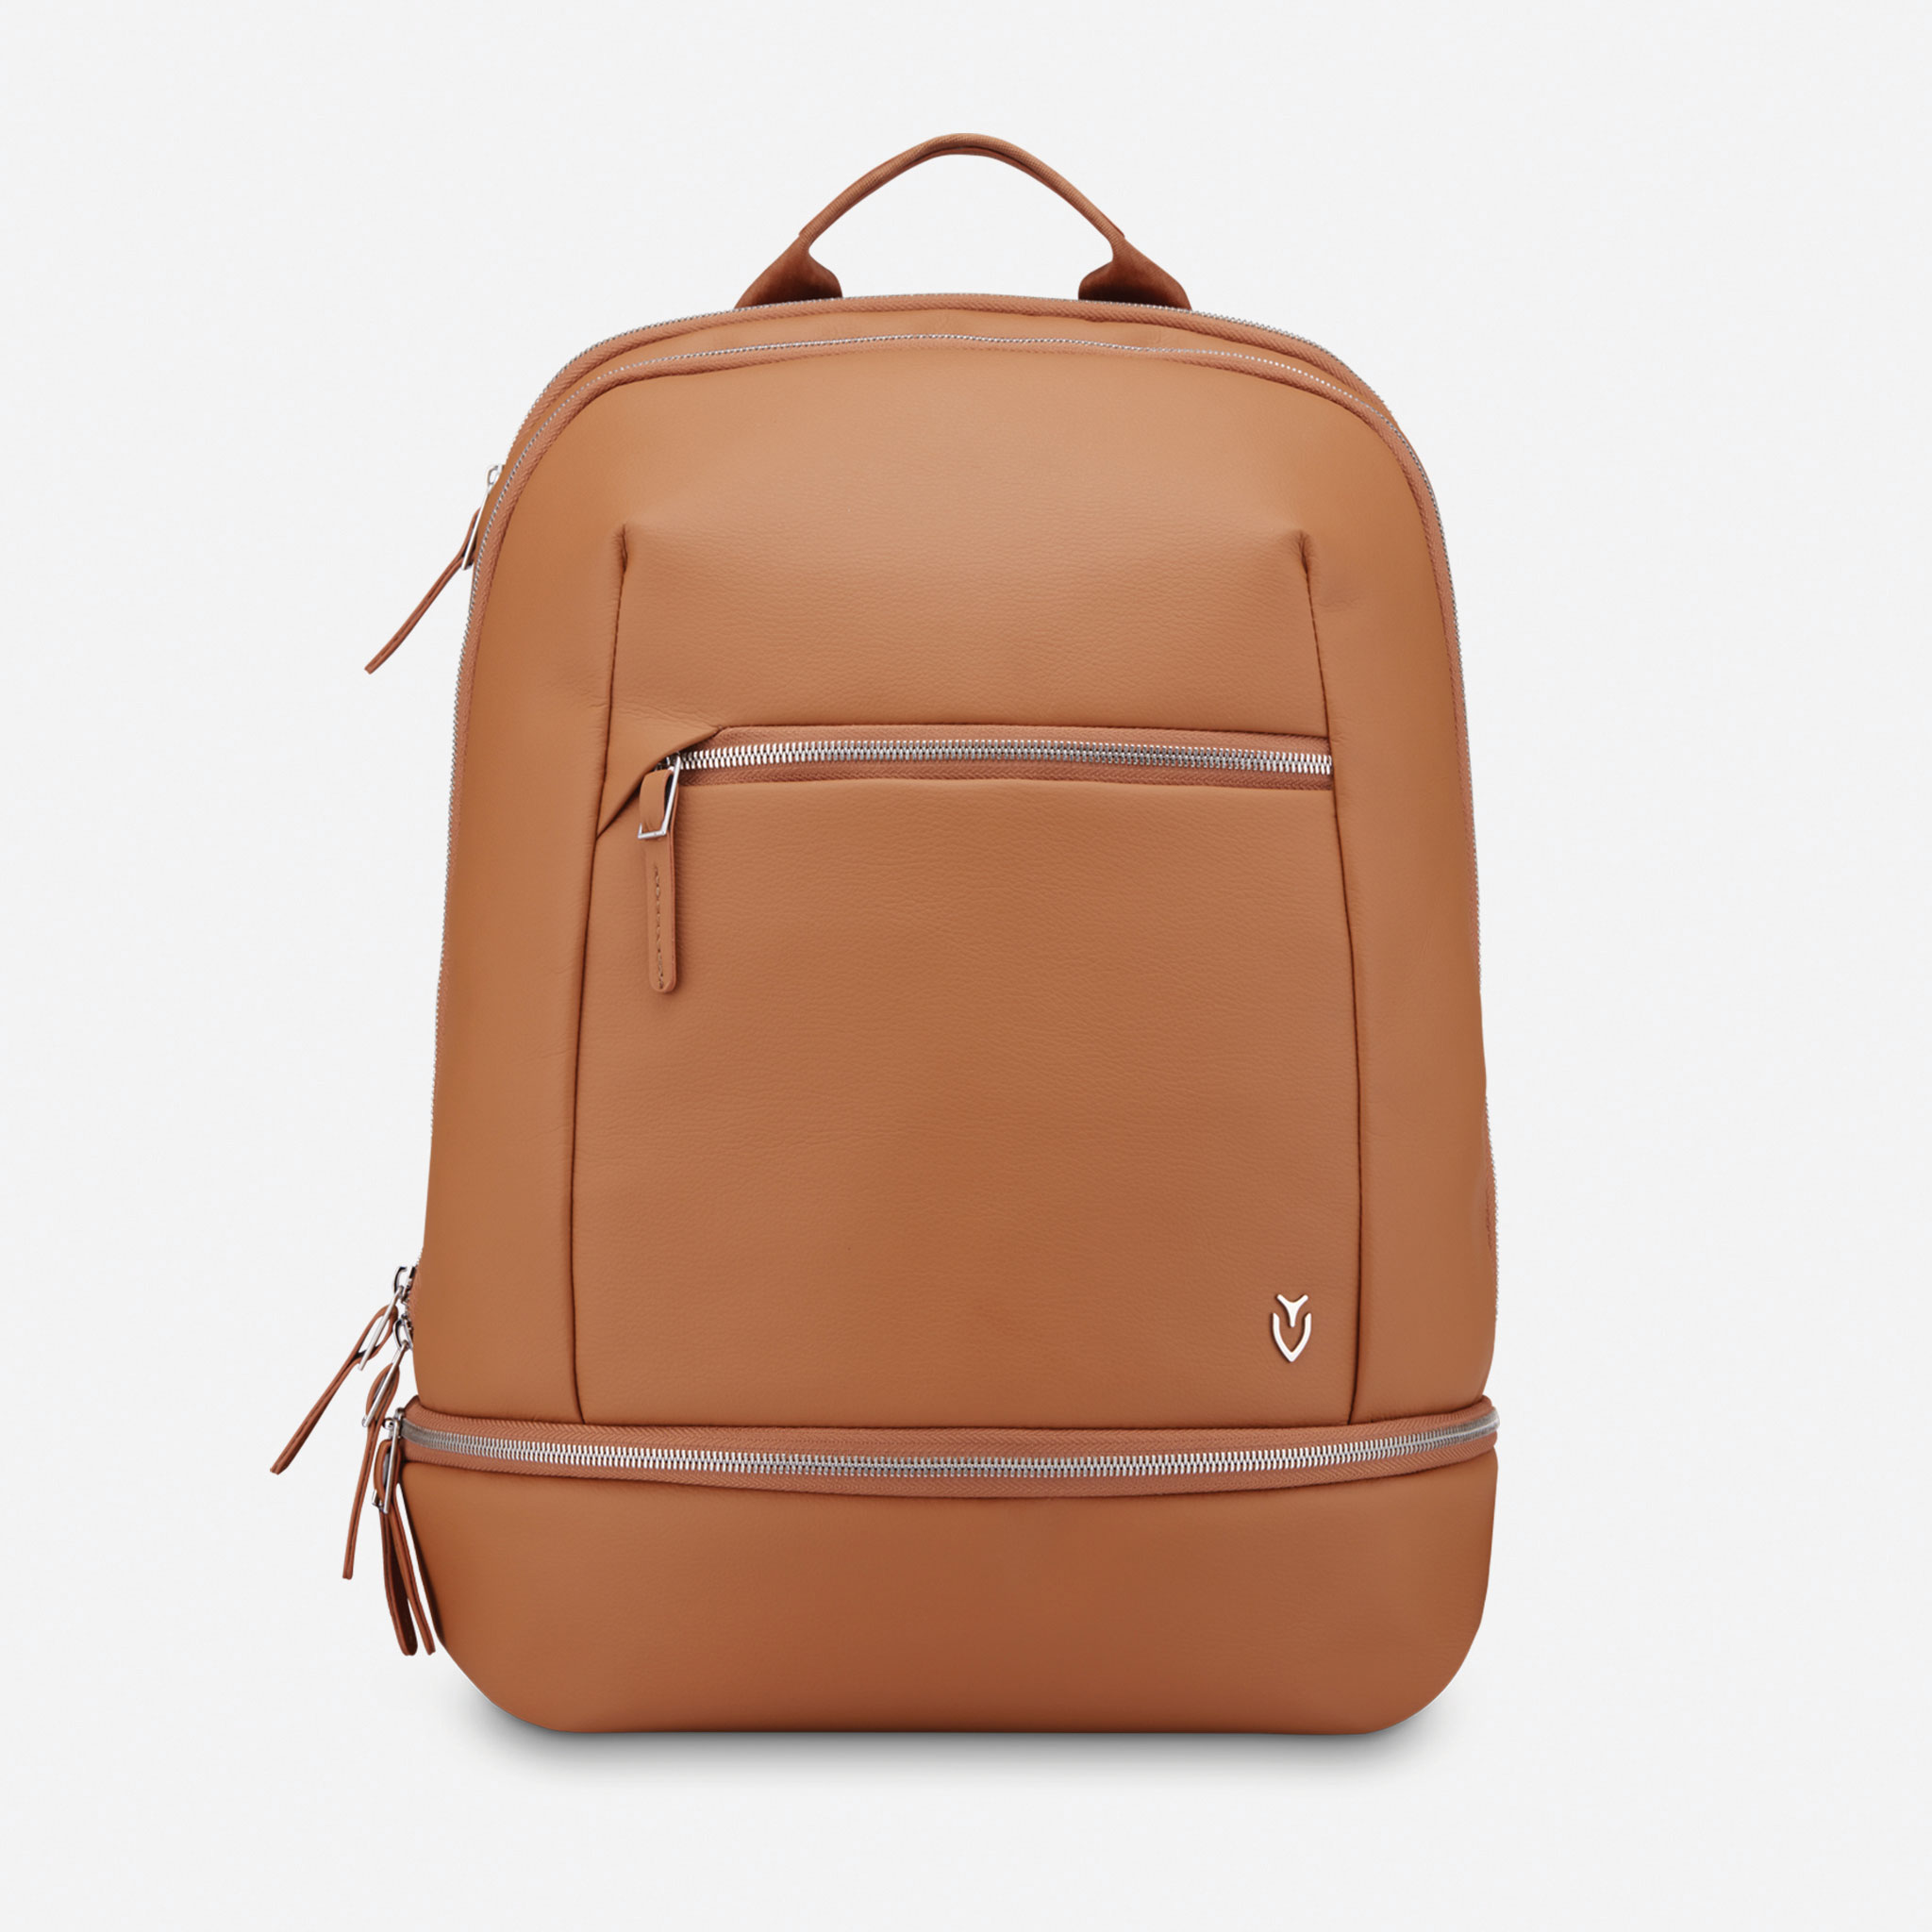 vessel bag signature 2.0 caramel tan